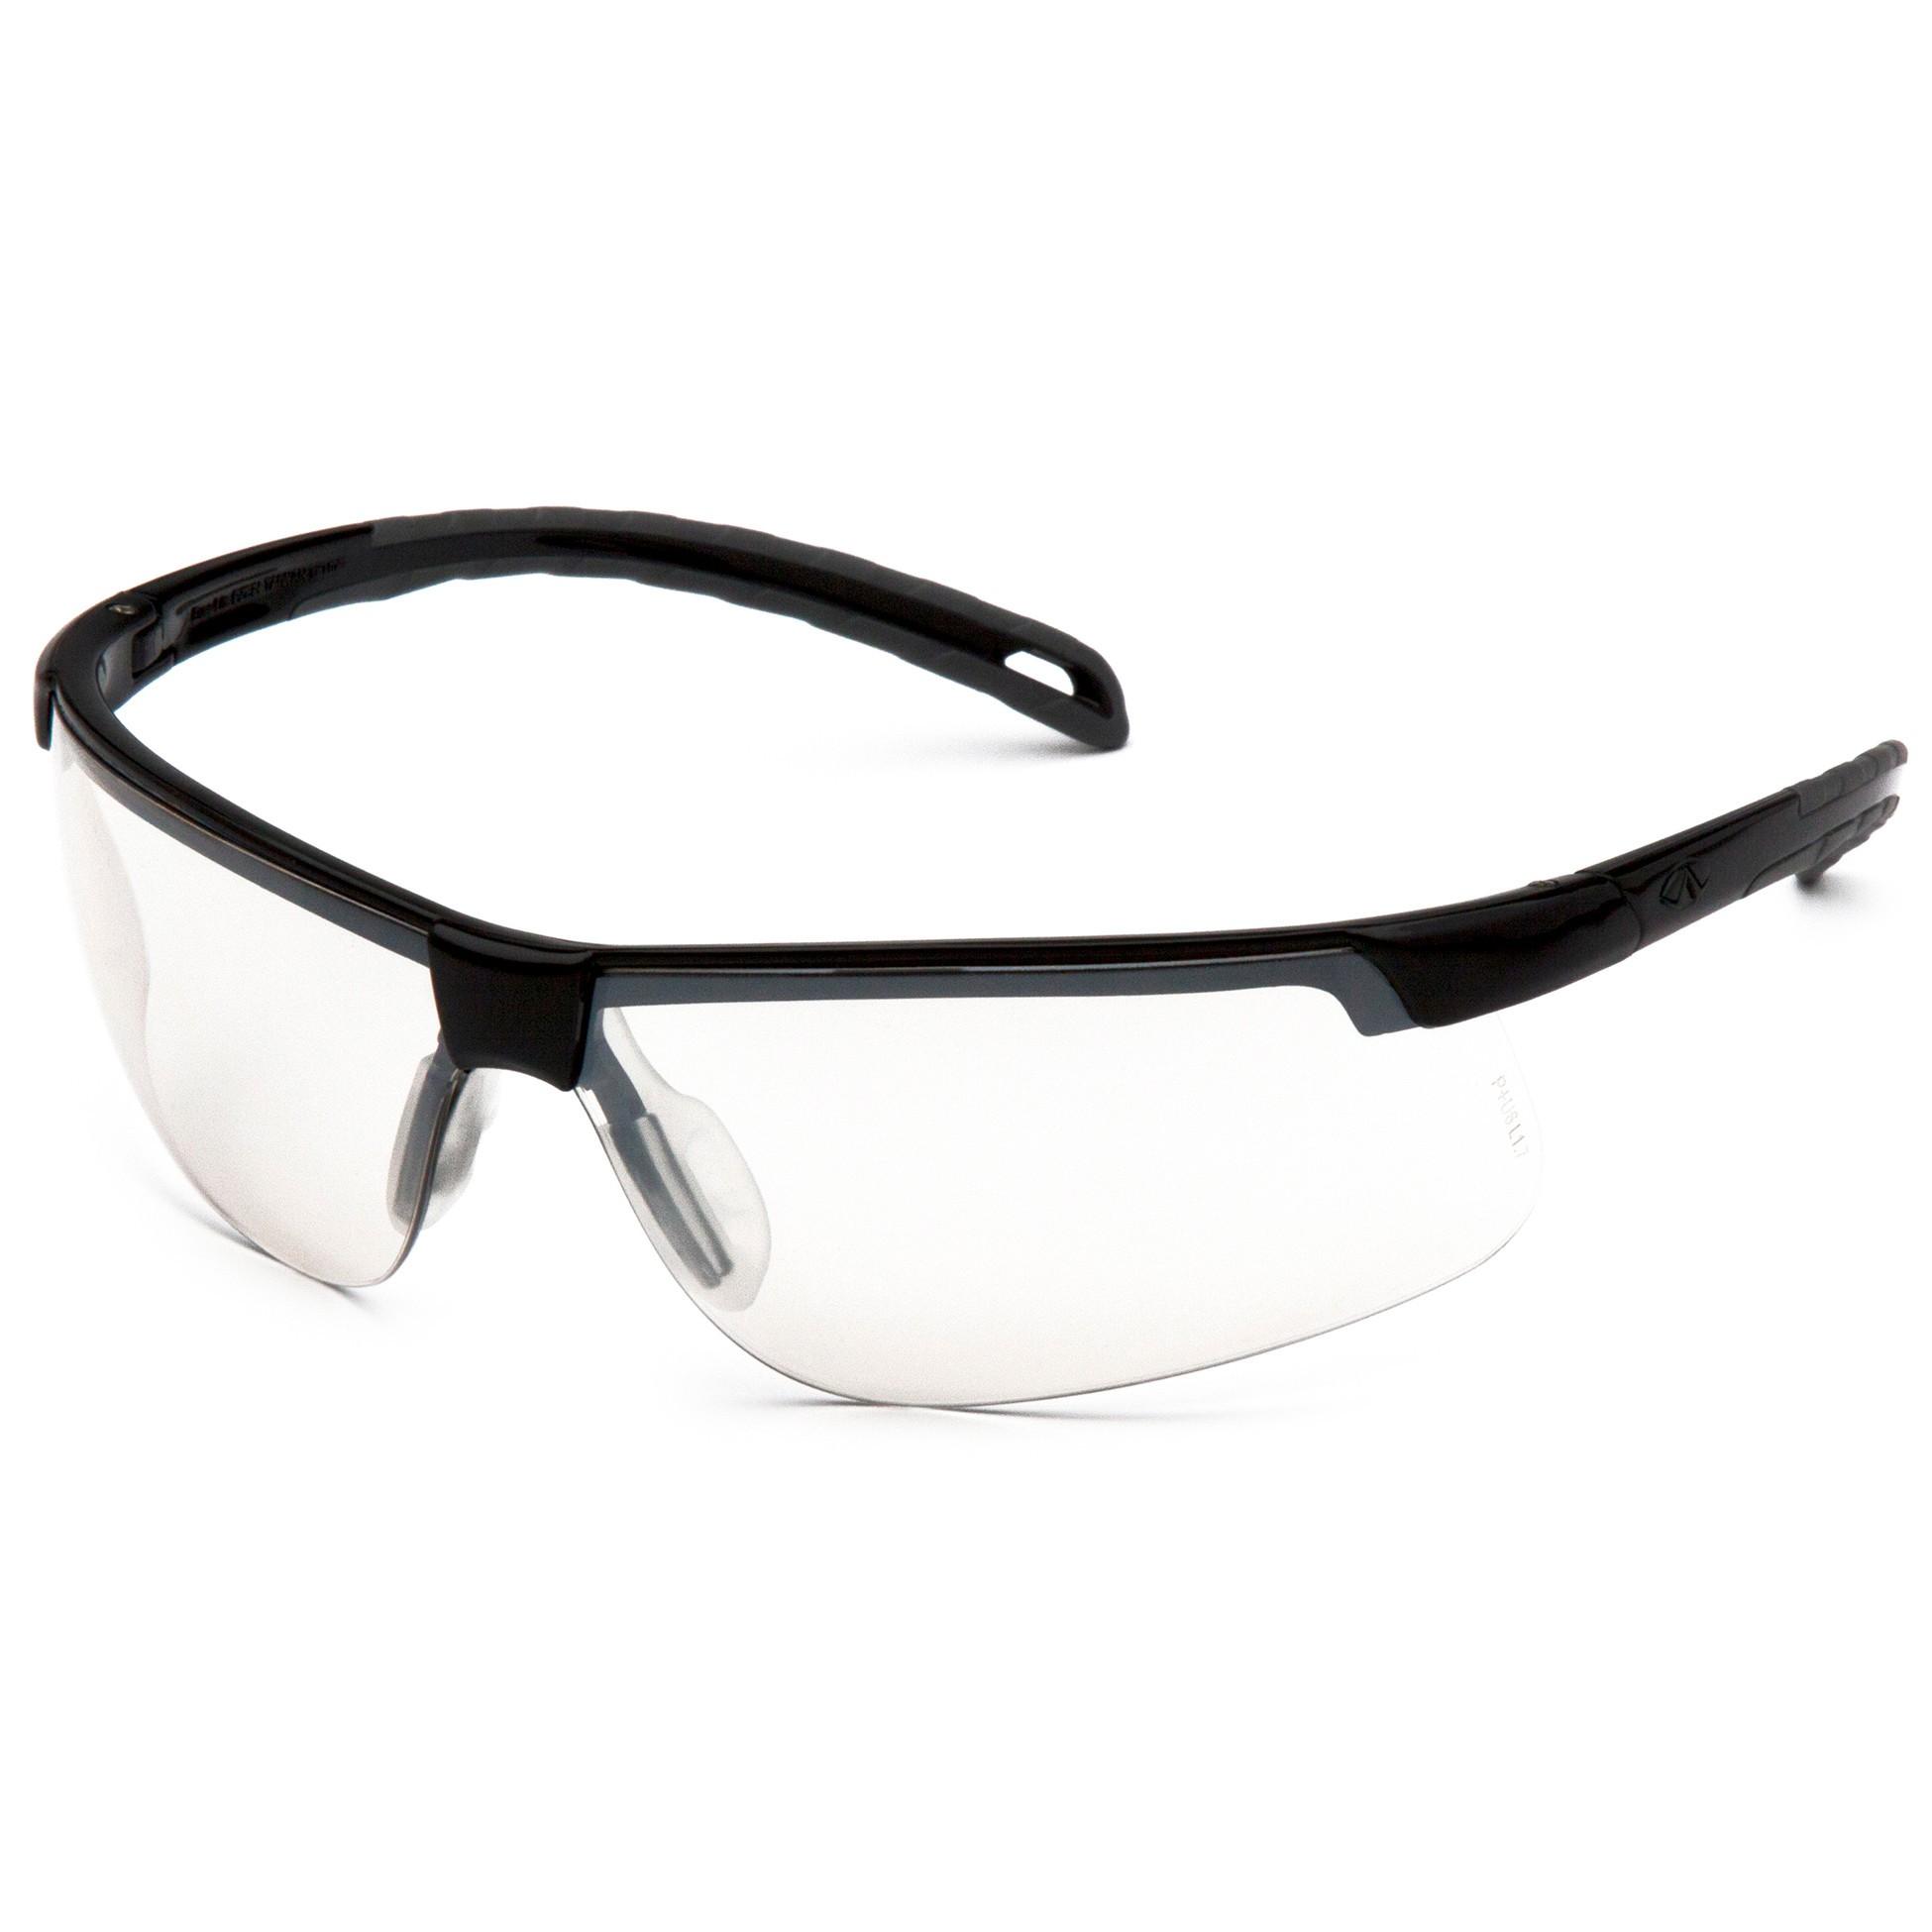 Pyramex SB8624D Ever-Lite Safety Glasses - Black Frame ...